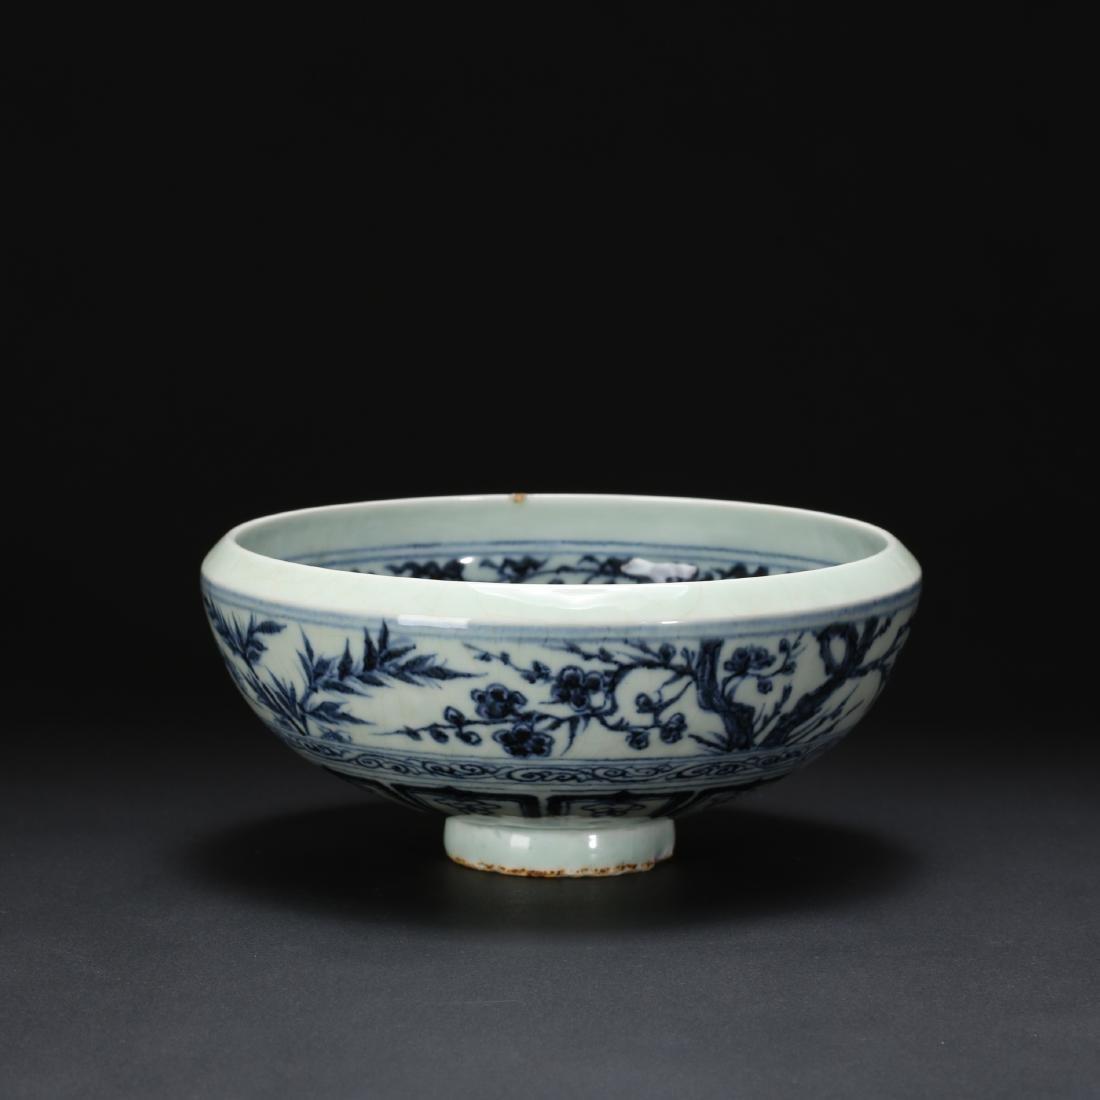 CHINESE BLUE AND WHITE FOLIAGE BOWL - 9